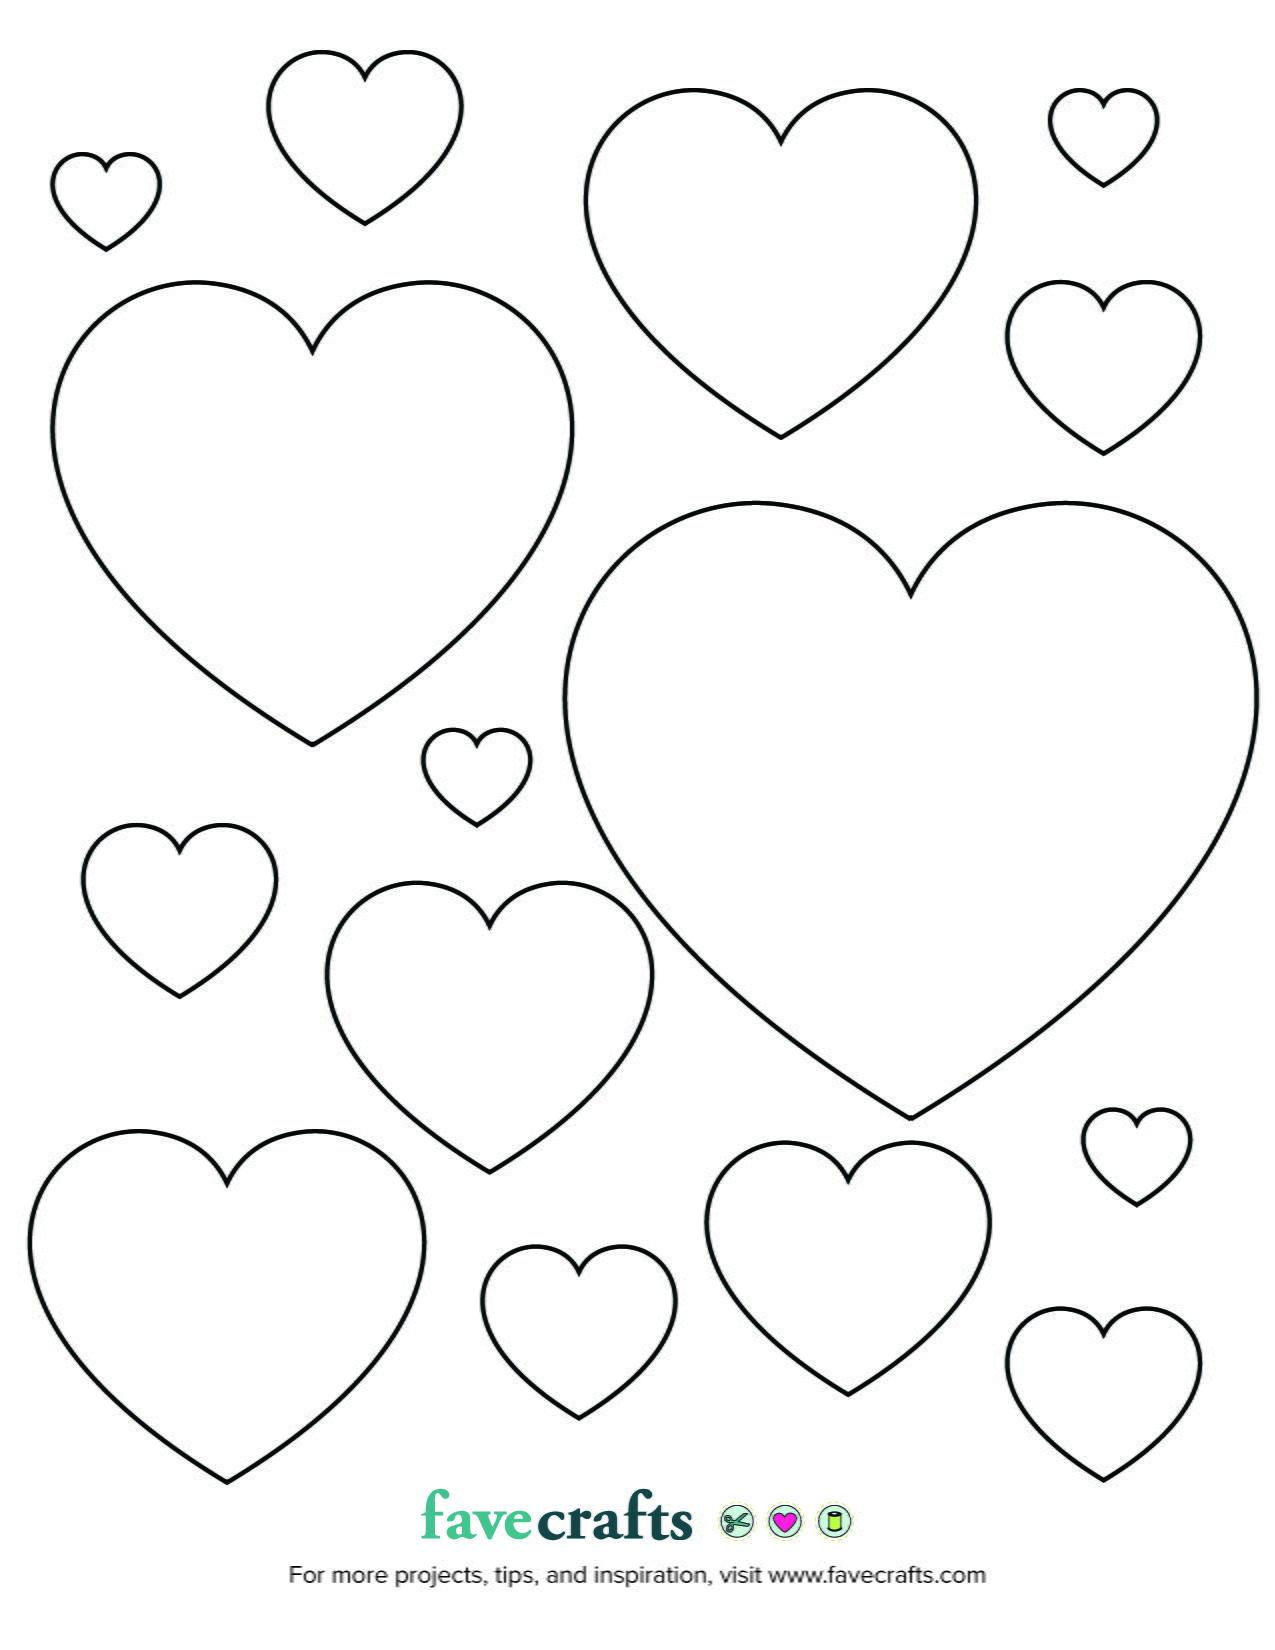 Printable Hearts Favecrafts Com